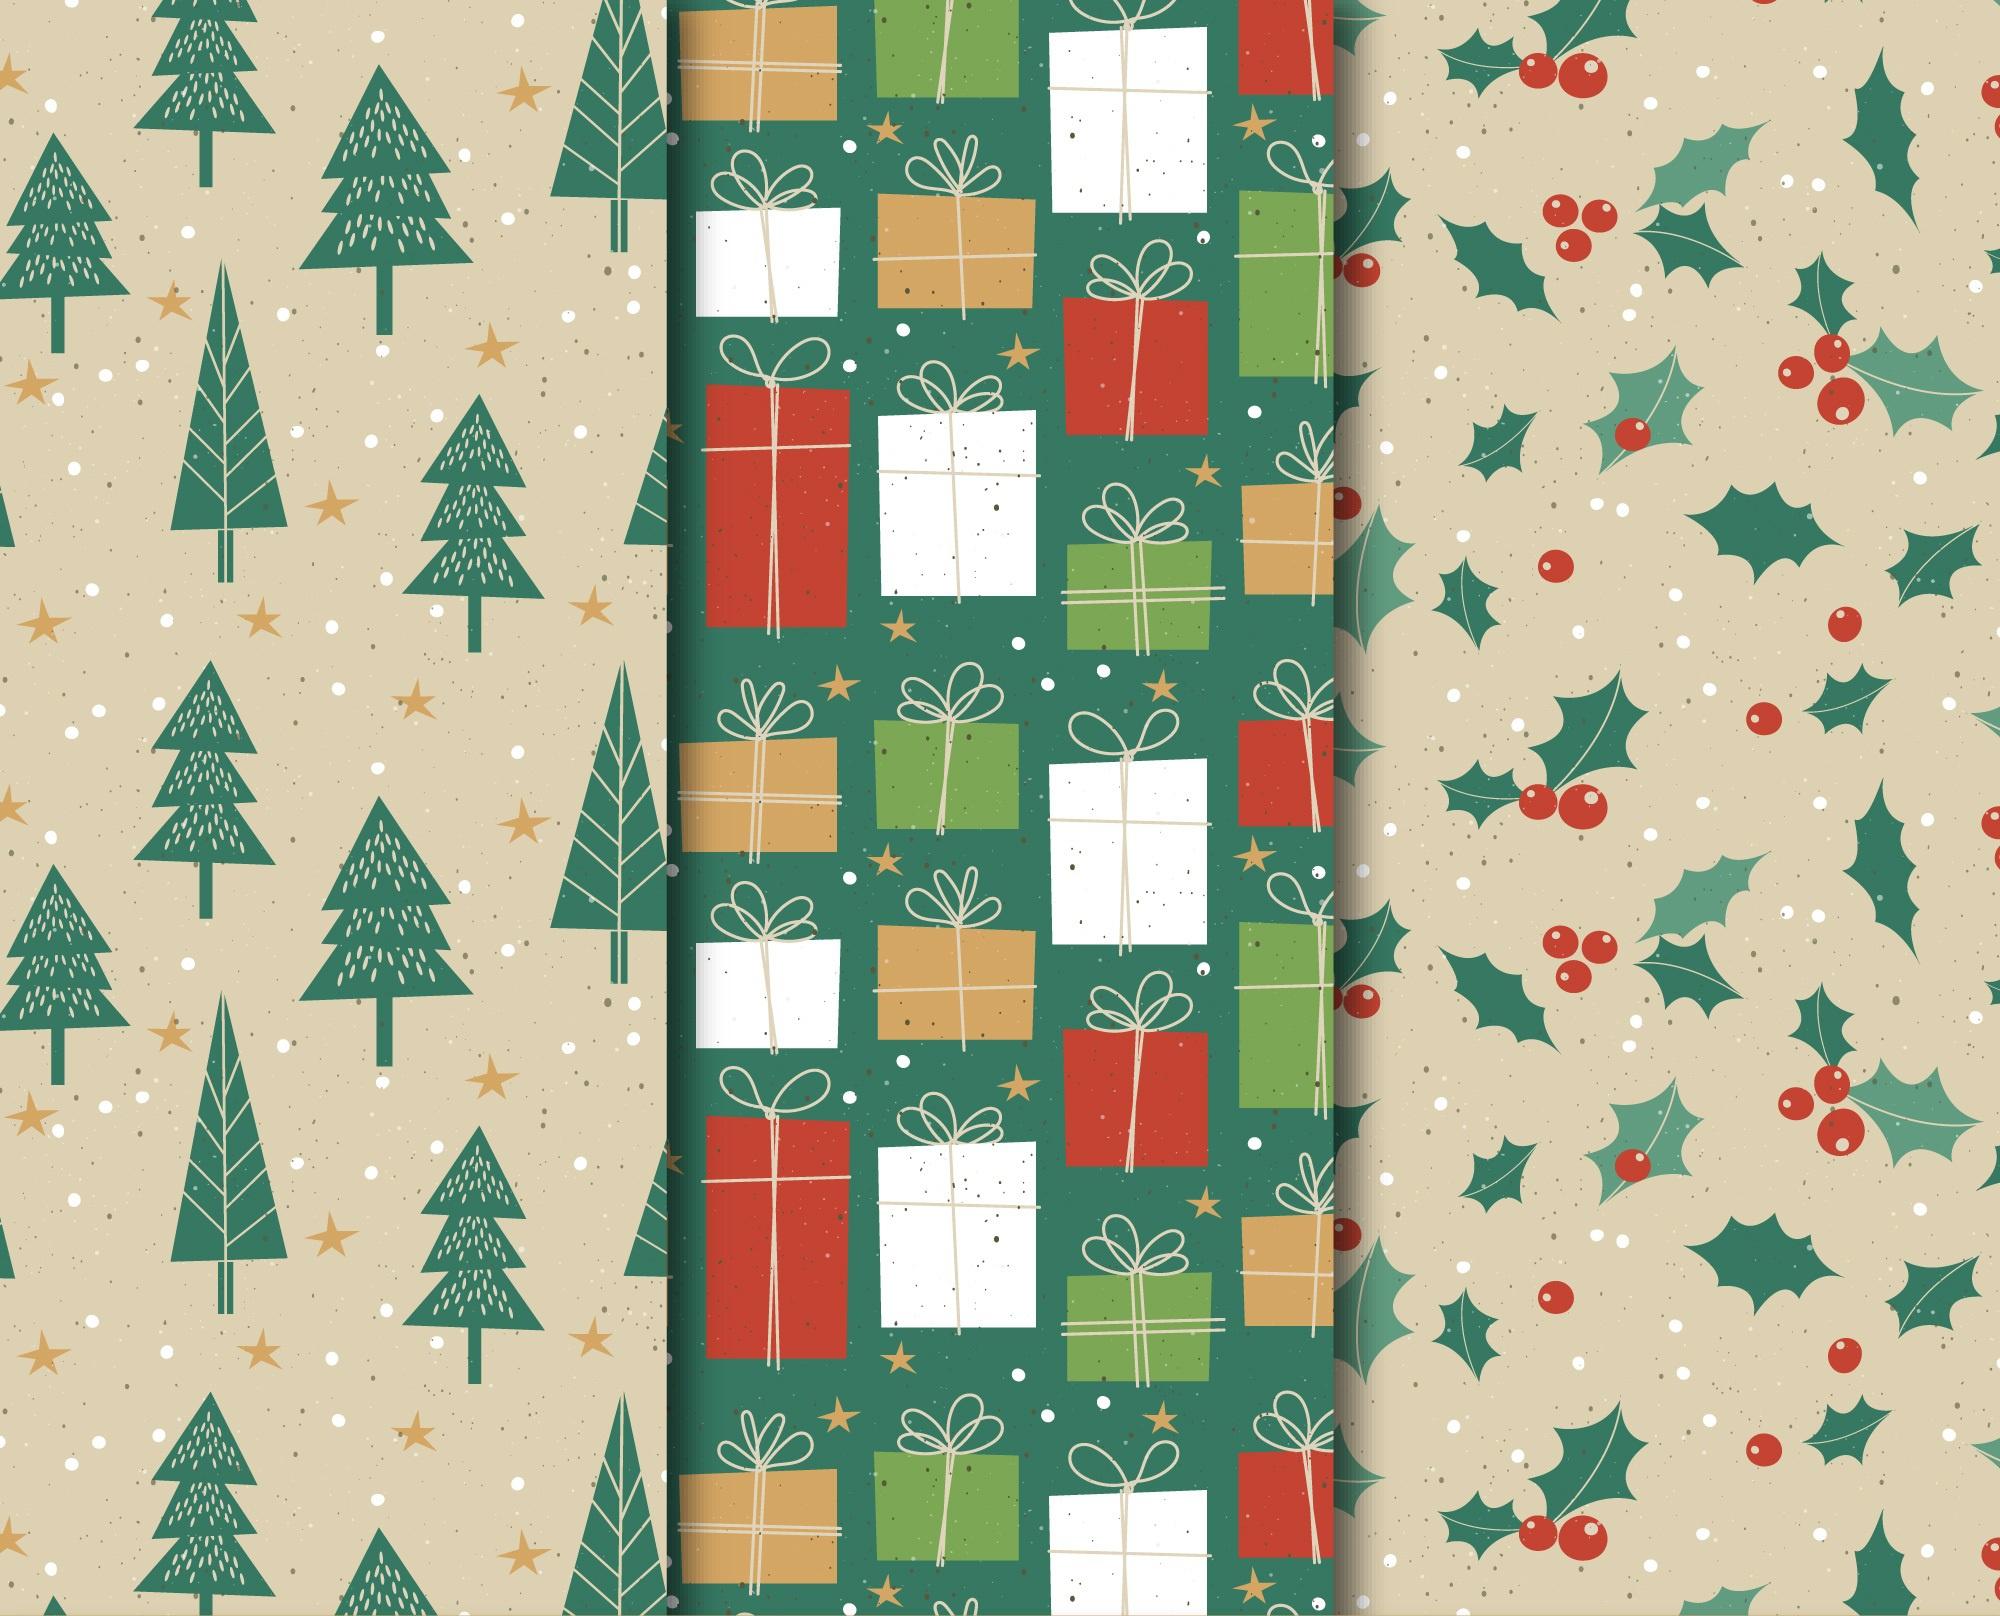 Christmas Texture.Wallpaper Christmas Texture Pattern 2000x1616